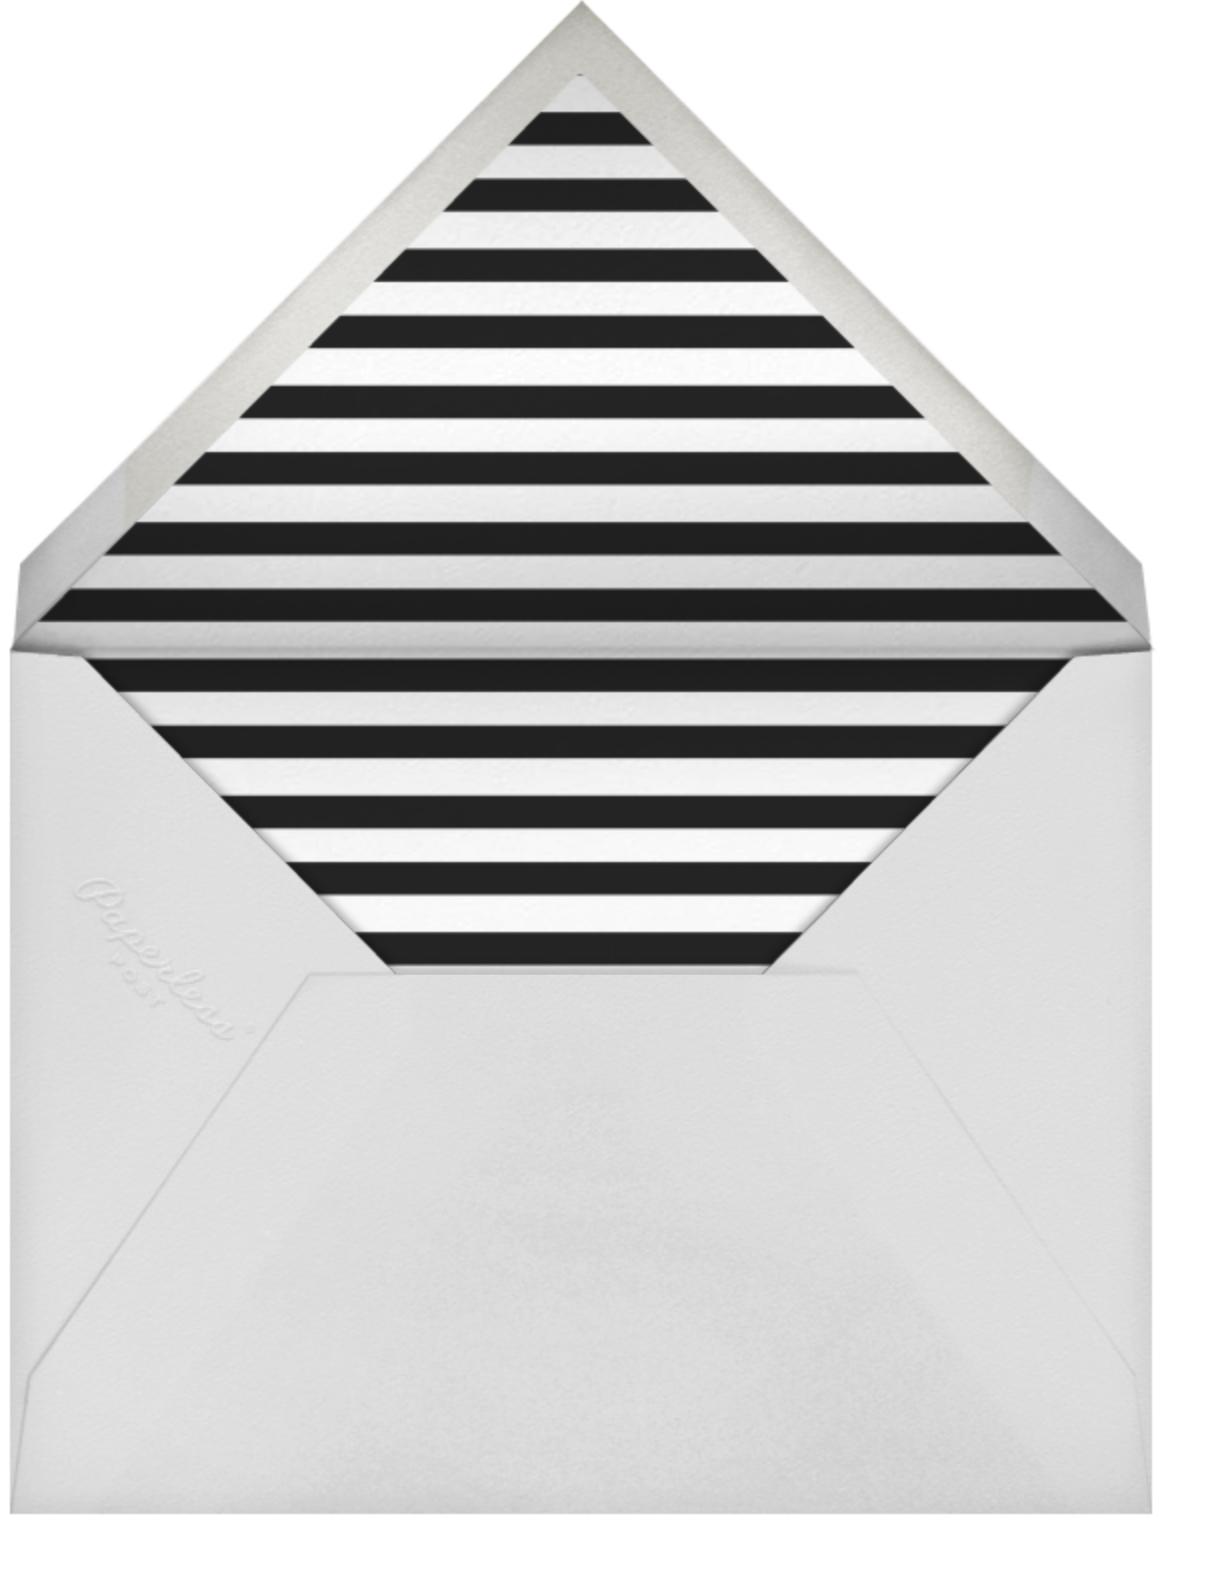 Confetti - Blush/Gold - kate spade new york - Engagement party - envelope back